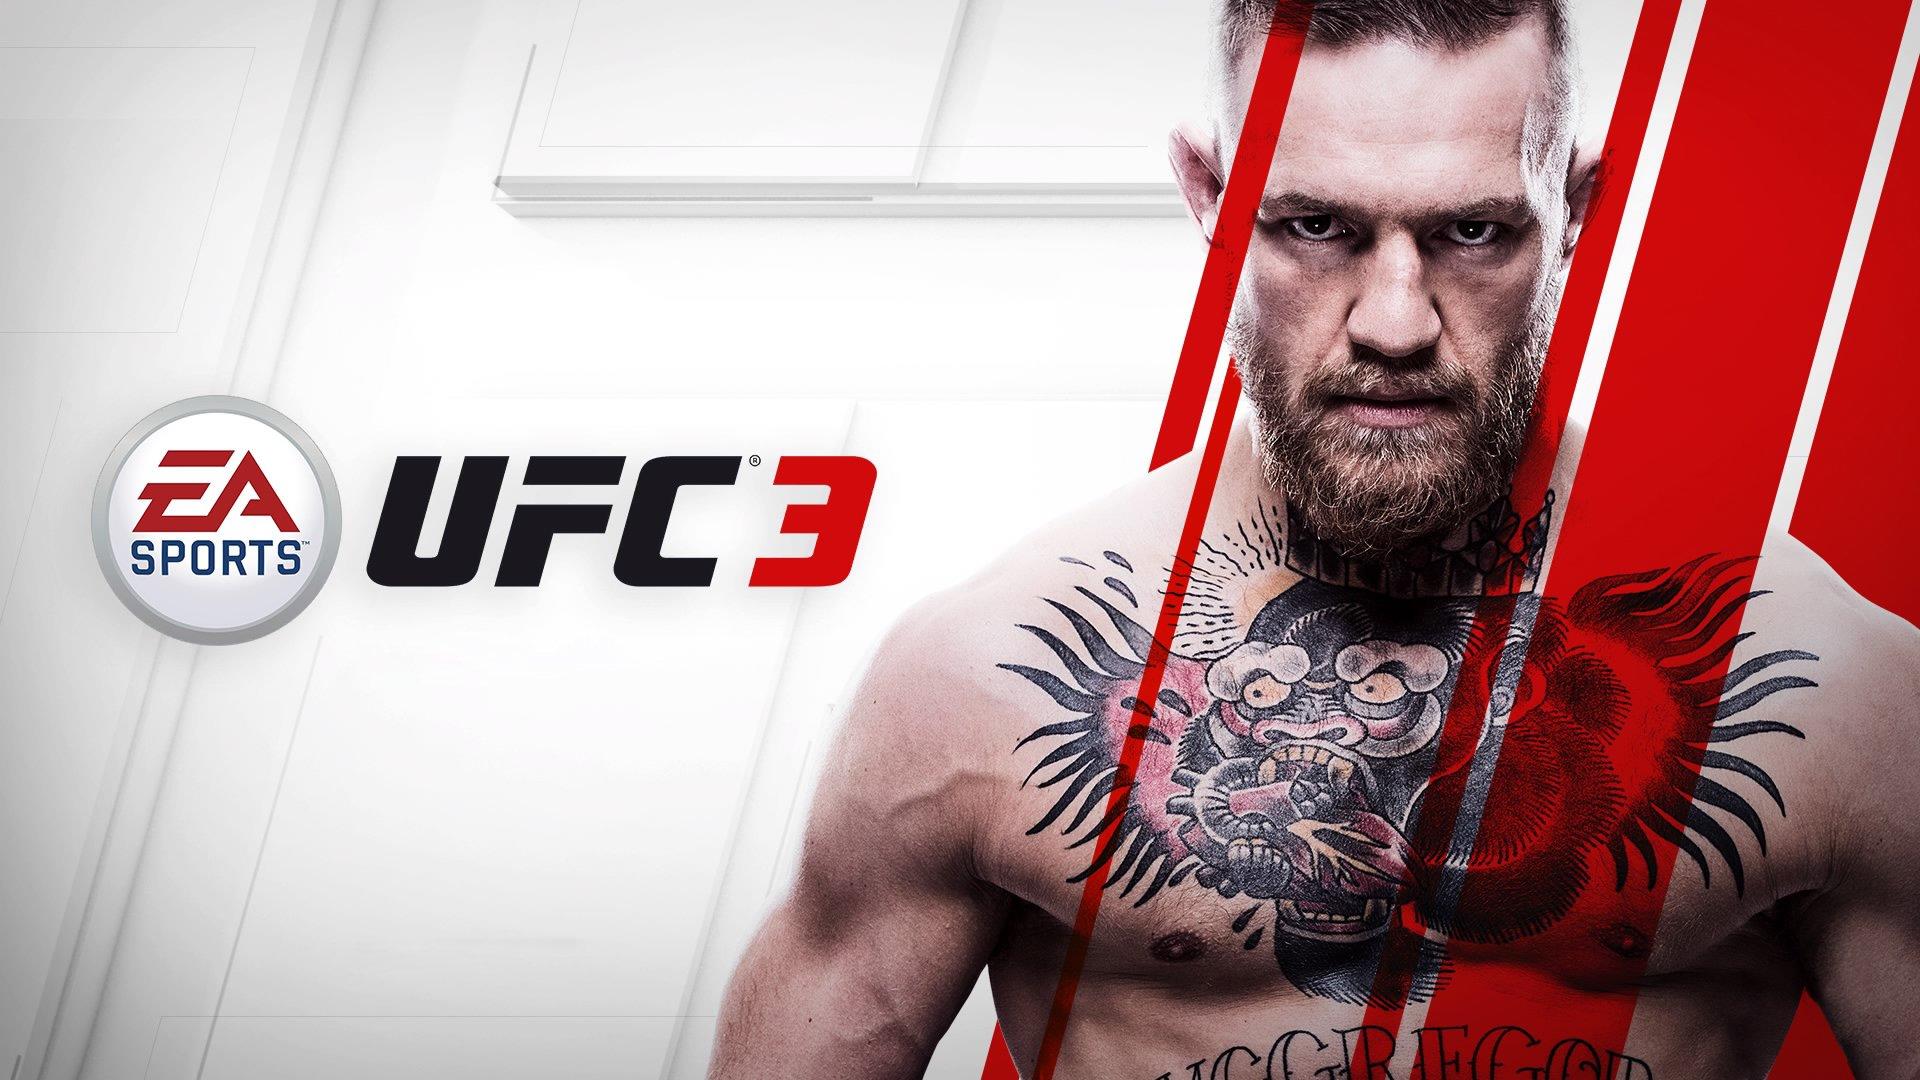 EA Sports UFC 3 Conor Mcgregor HD Wallpaper Background Image 1920x1080